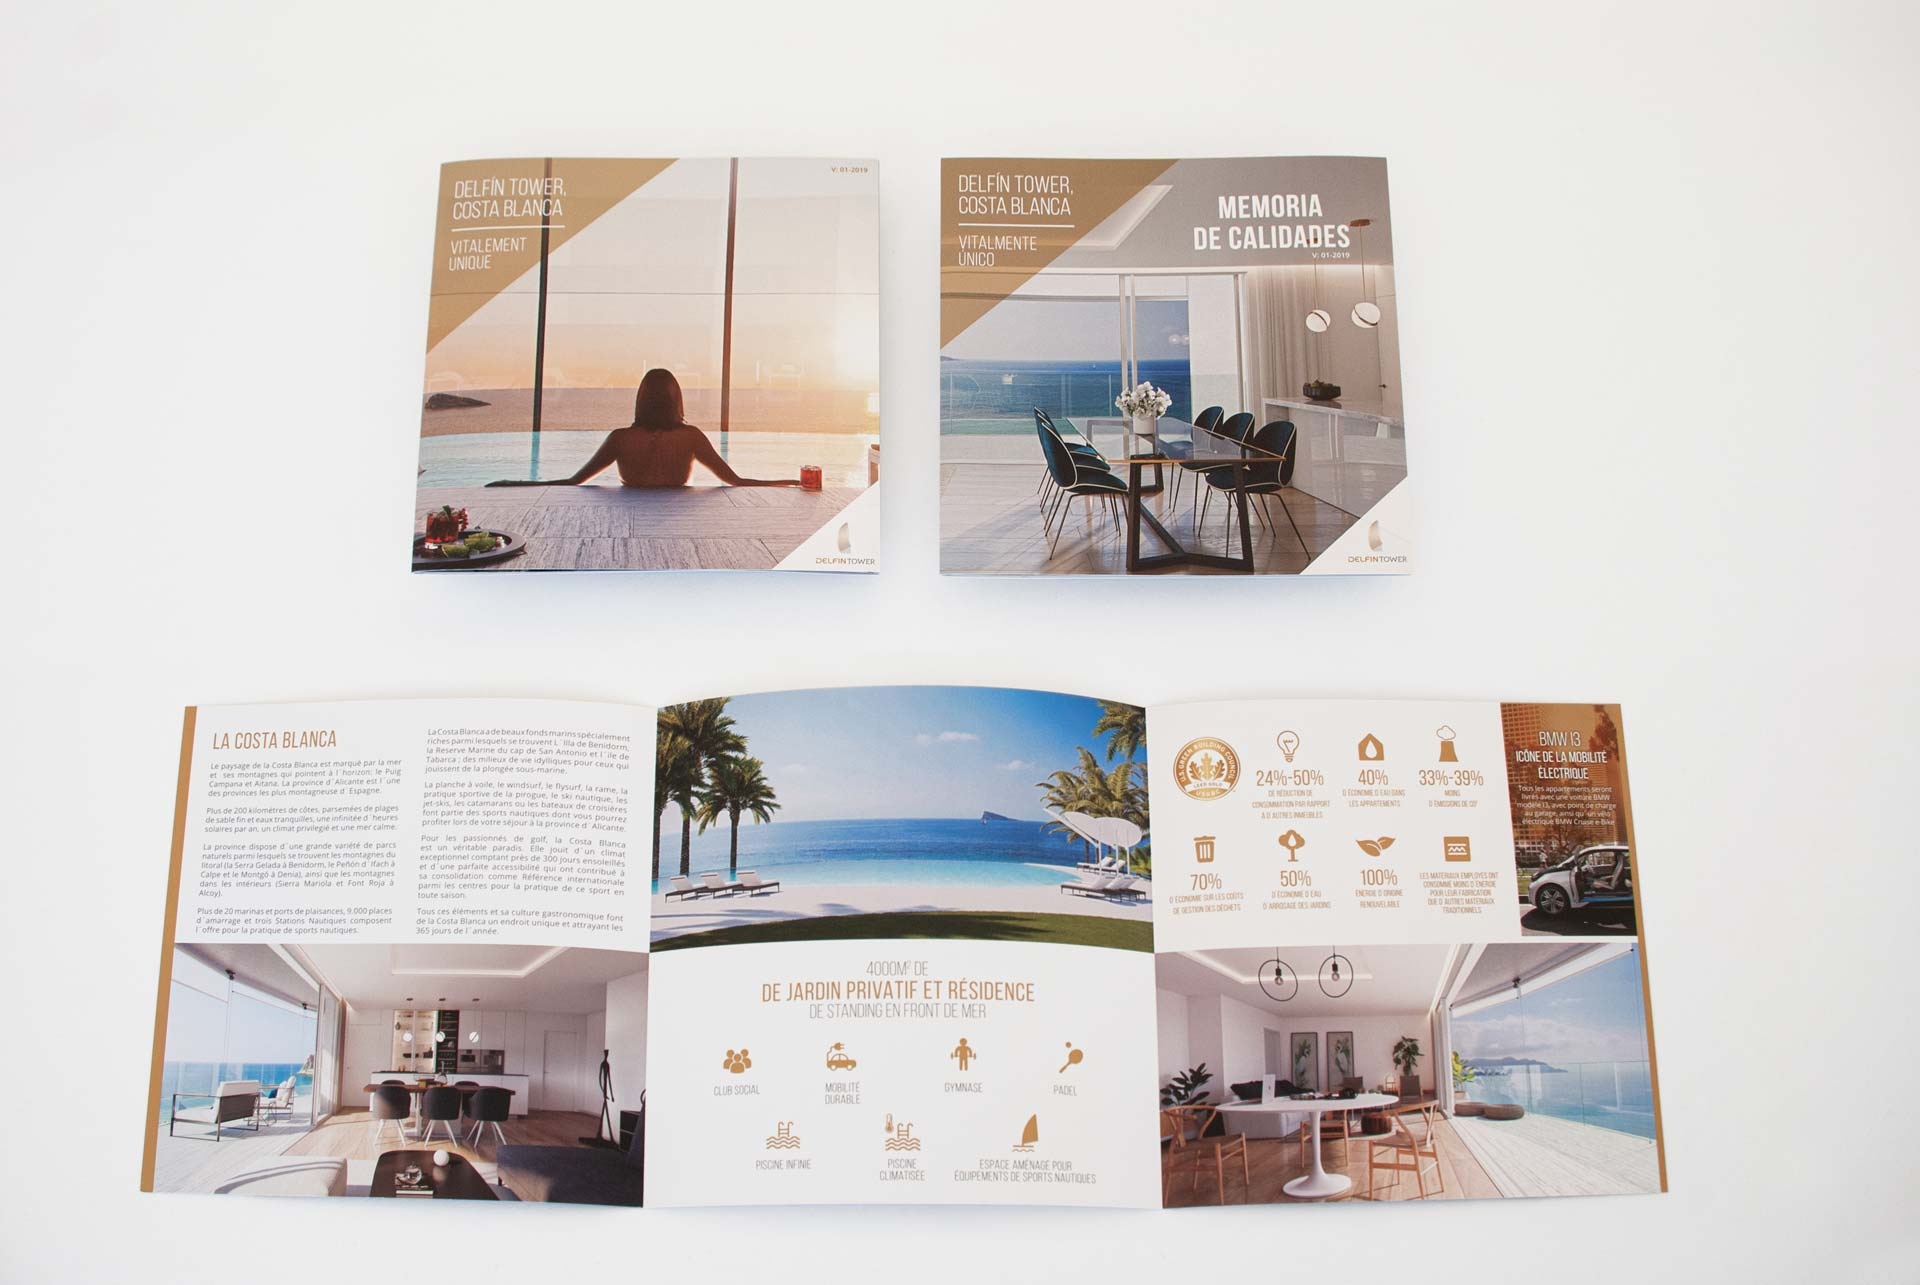 giset design delfin tower identidad corporativa flyer triptico